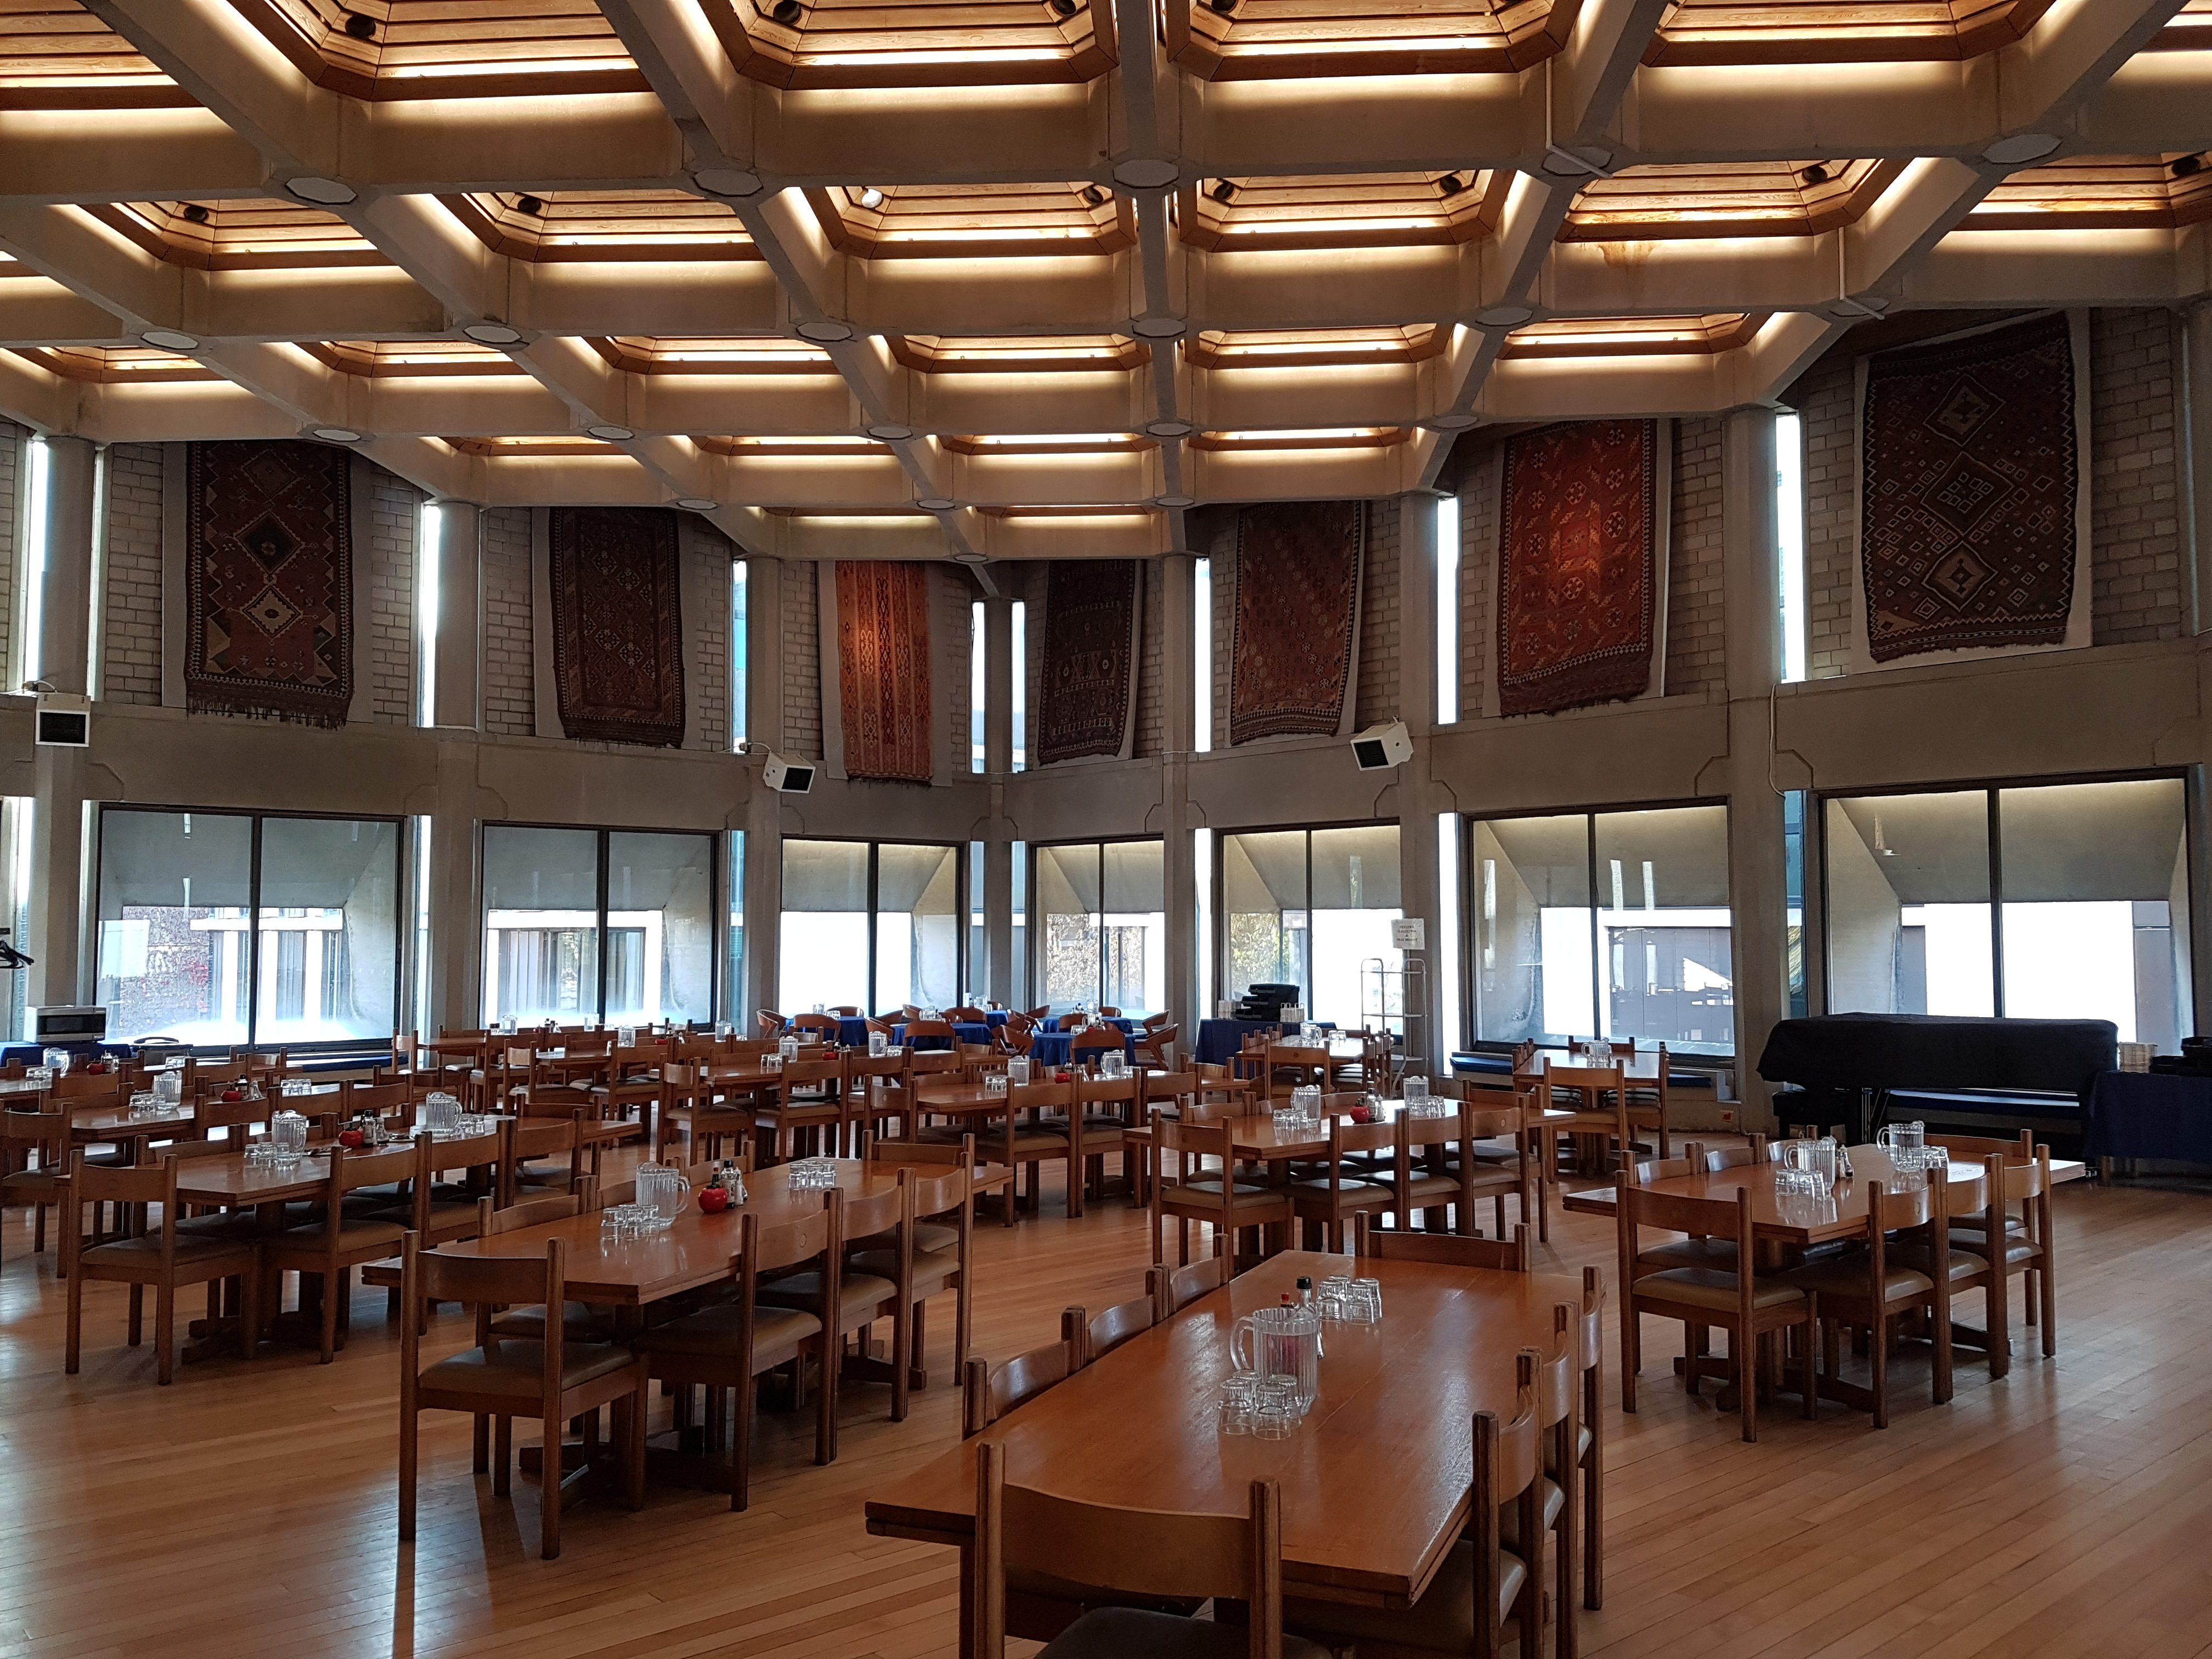 St Antony S Named Best College Dining Room St Antony S